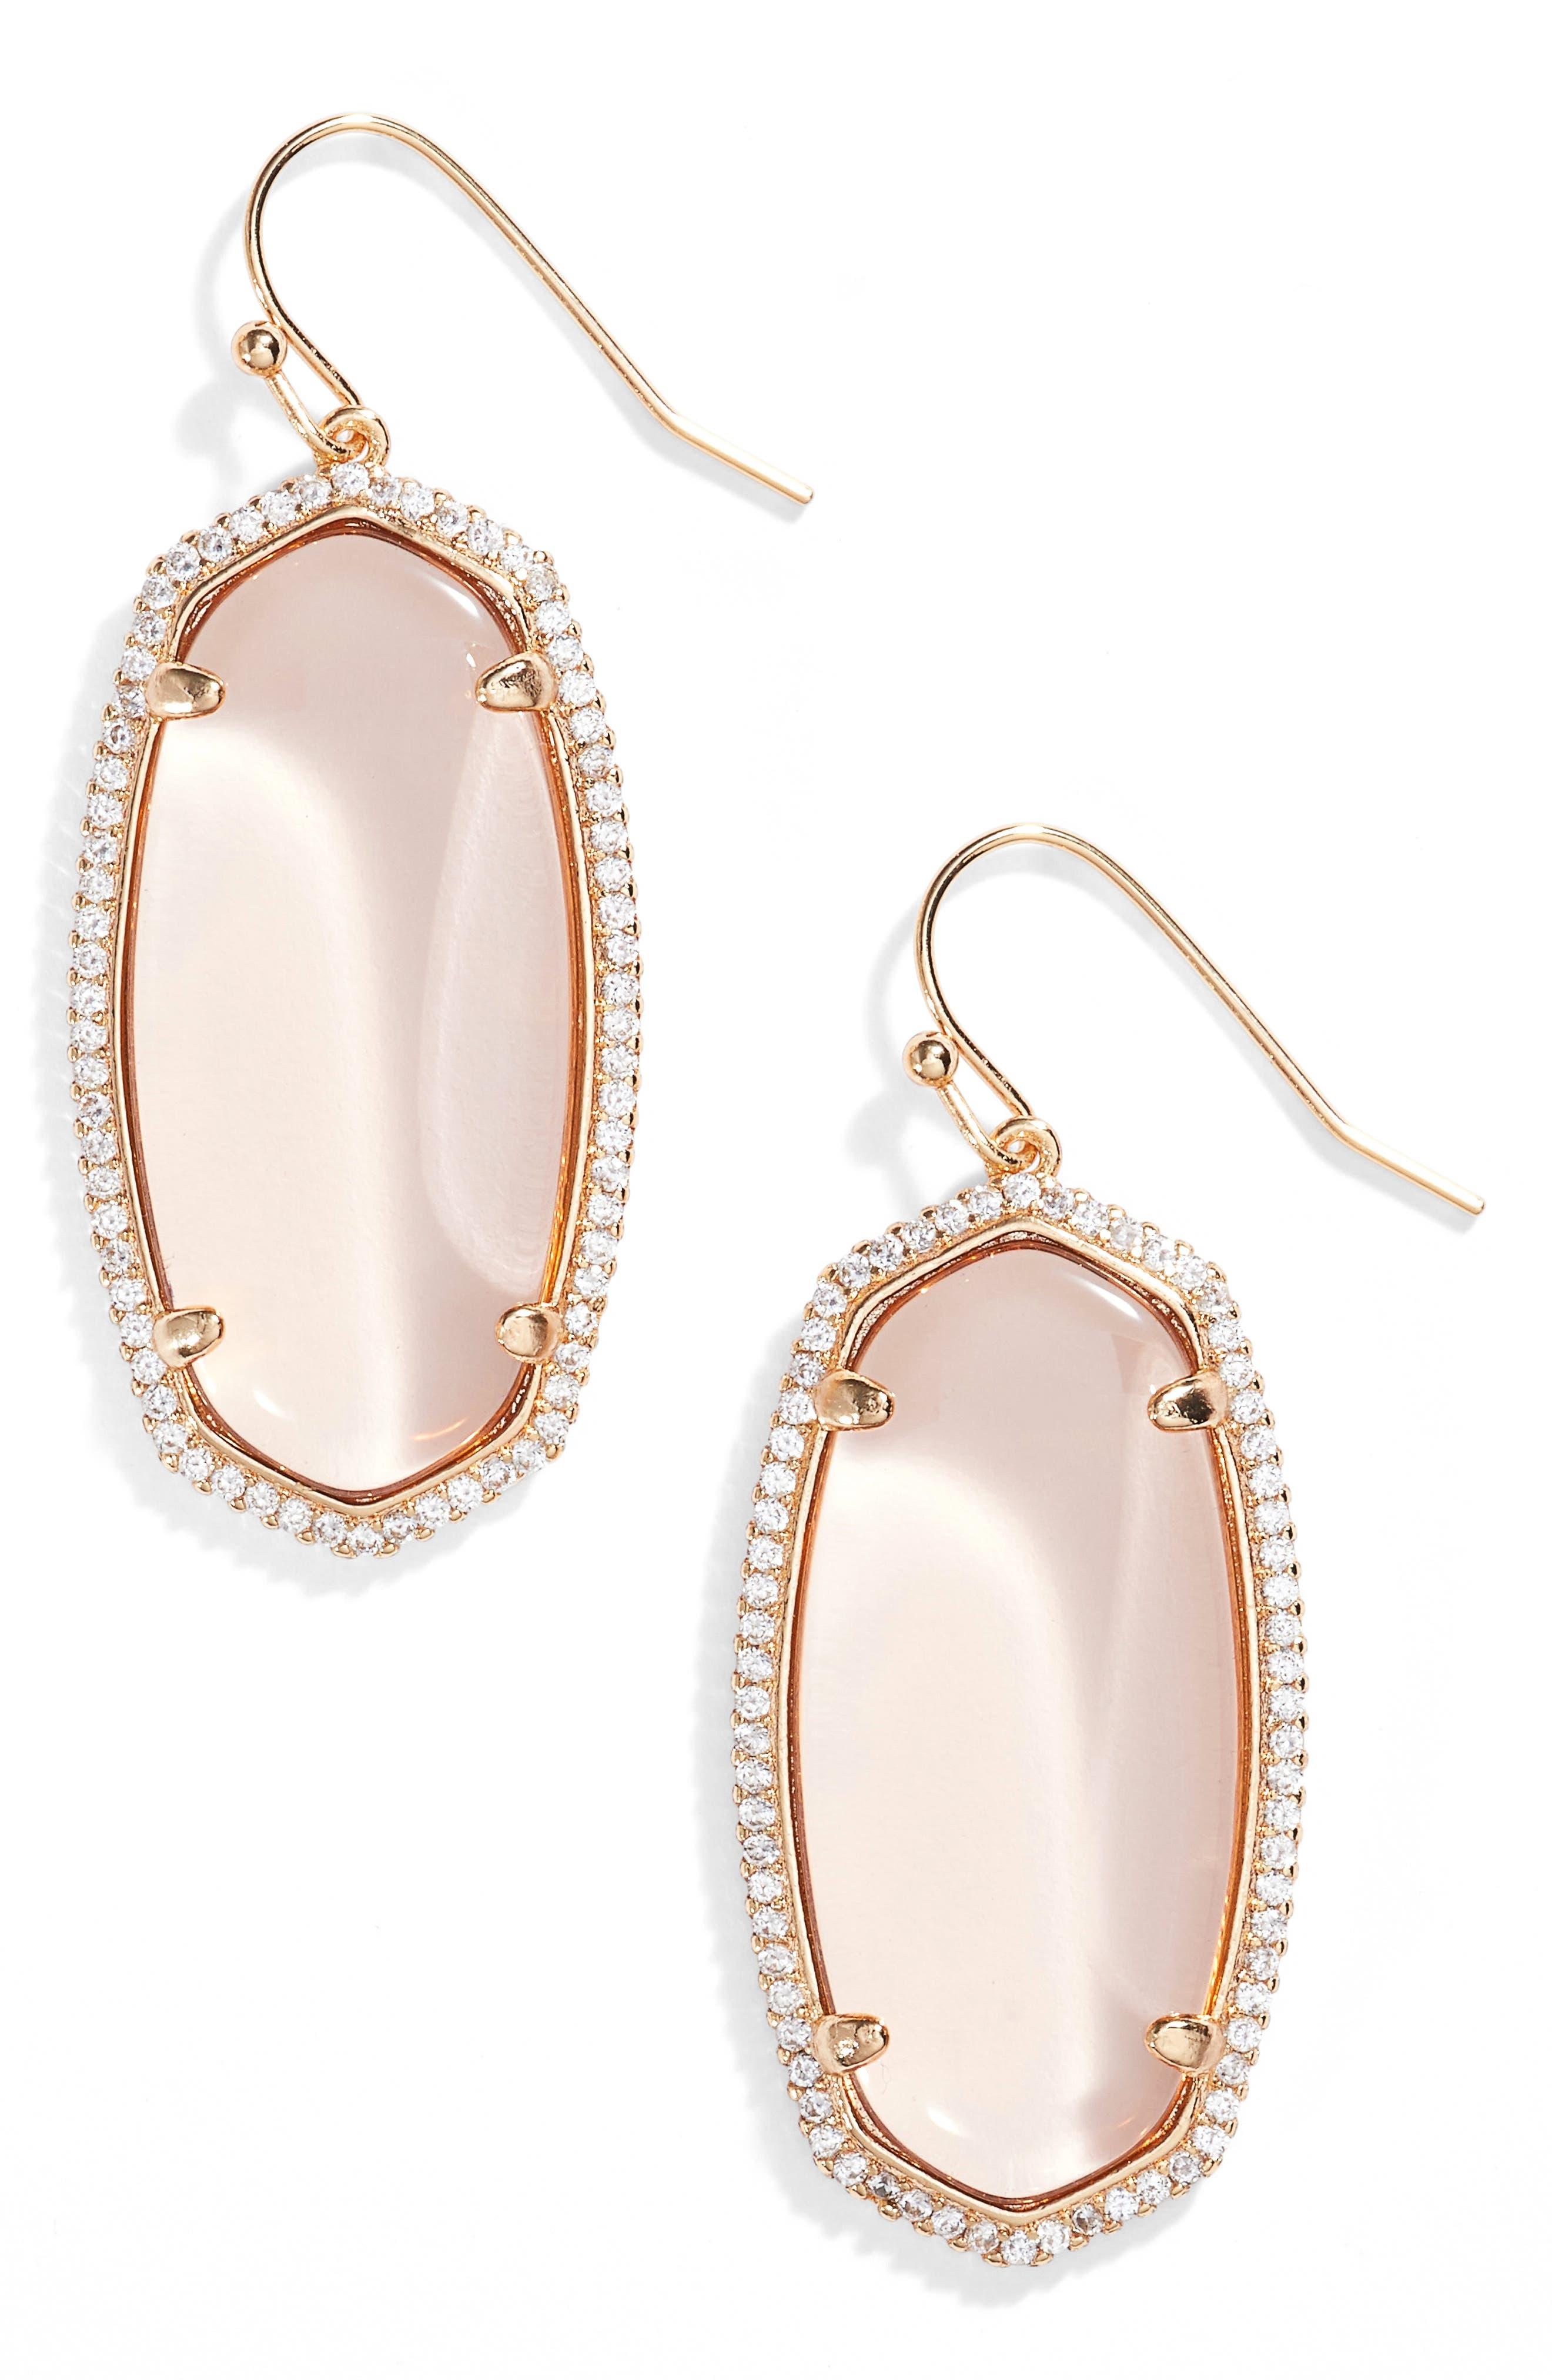 Elle Pavé Drop Earrings,                         Main,                         color, Peach Clear Glass/ Rose Gold